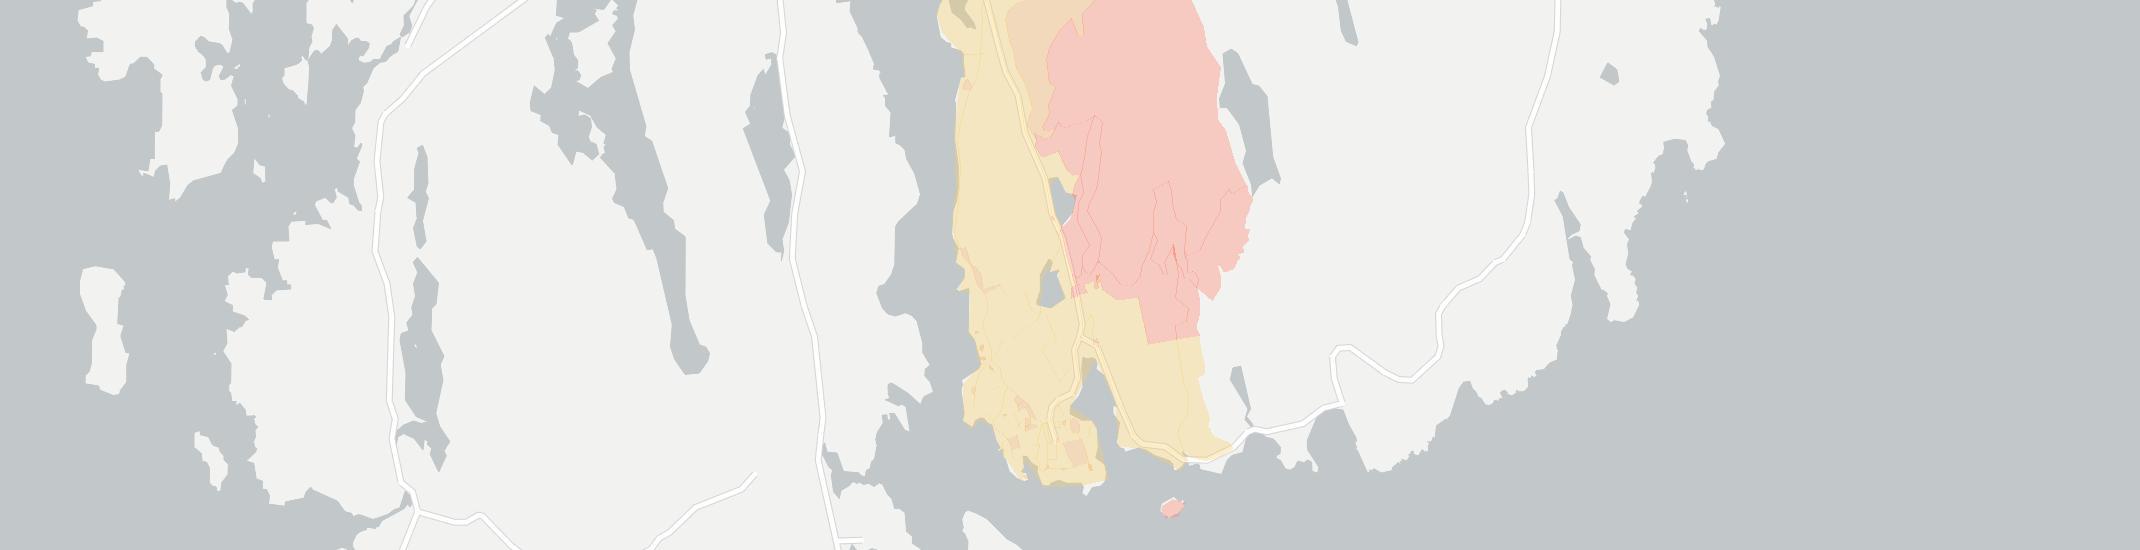 Northeast Harbor Maine Map.Internet Providers In Northeast Harbor Compare 7 Providers